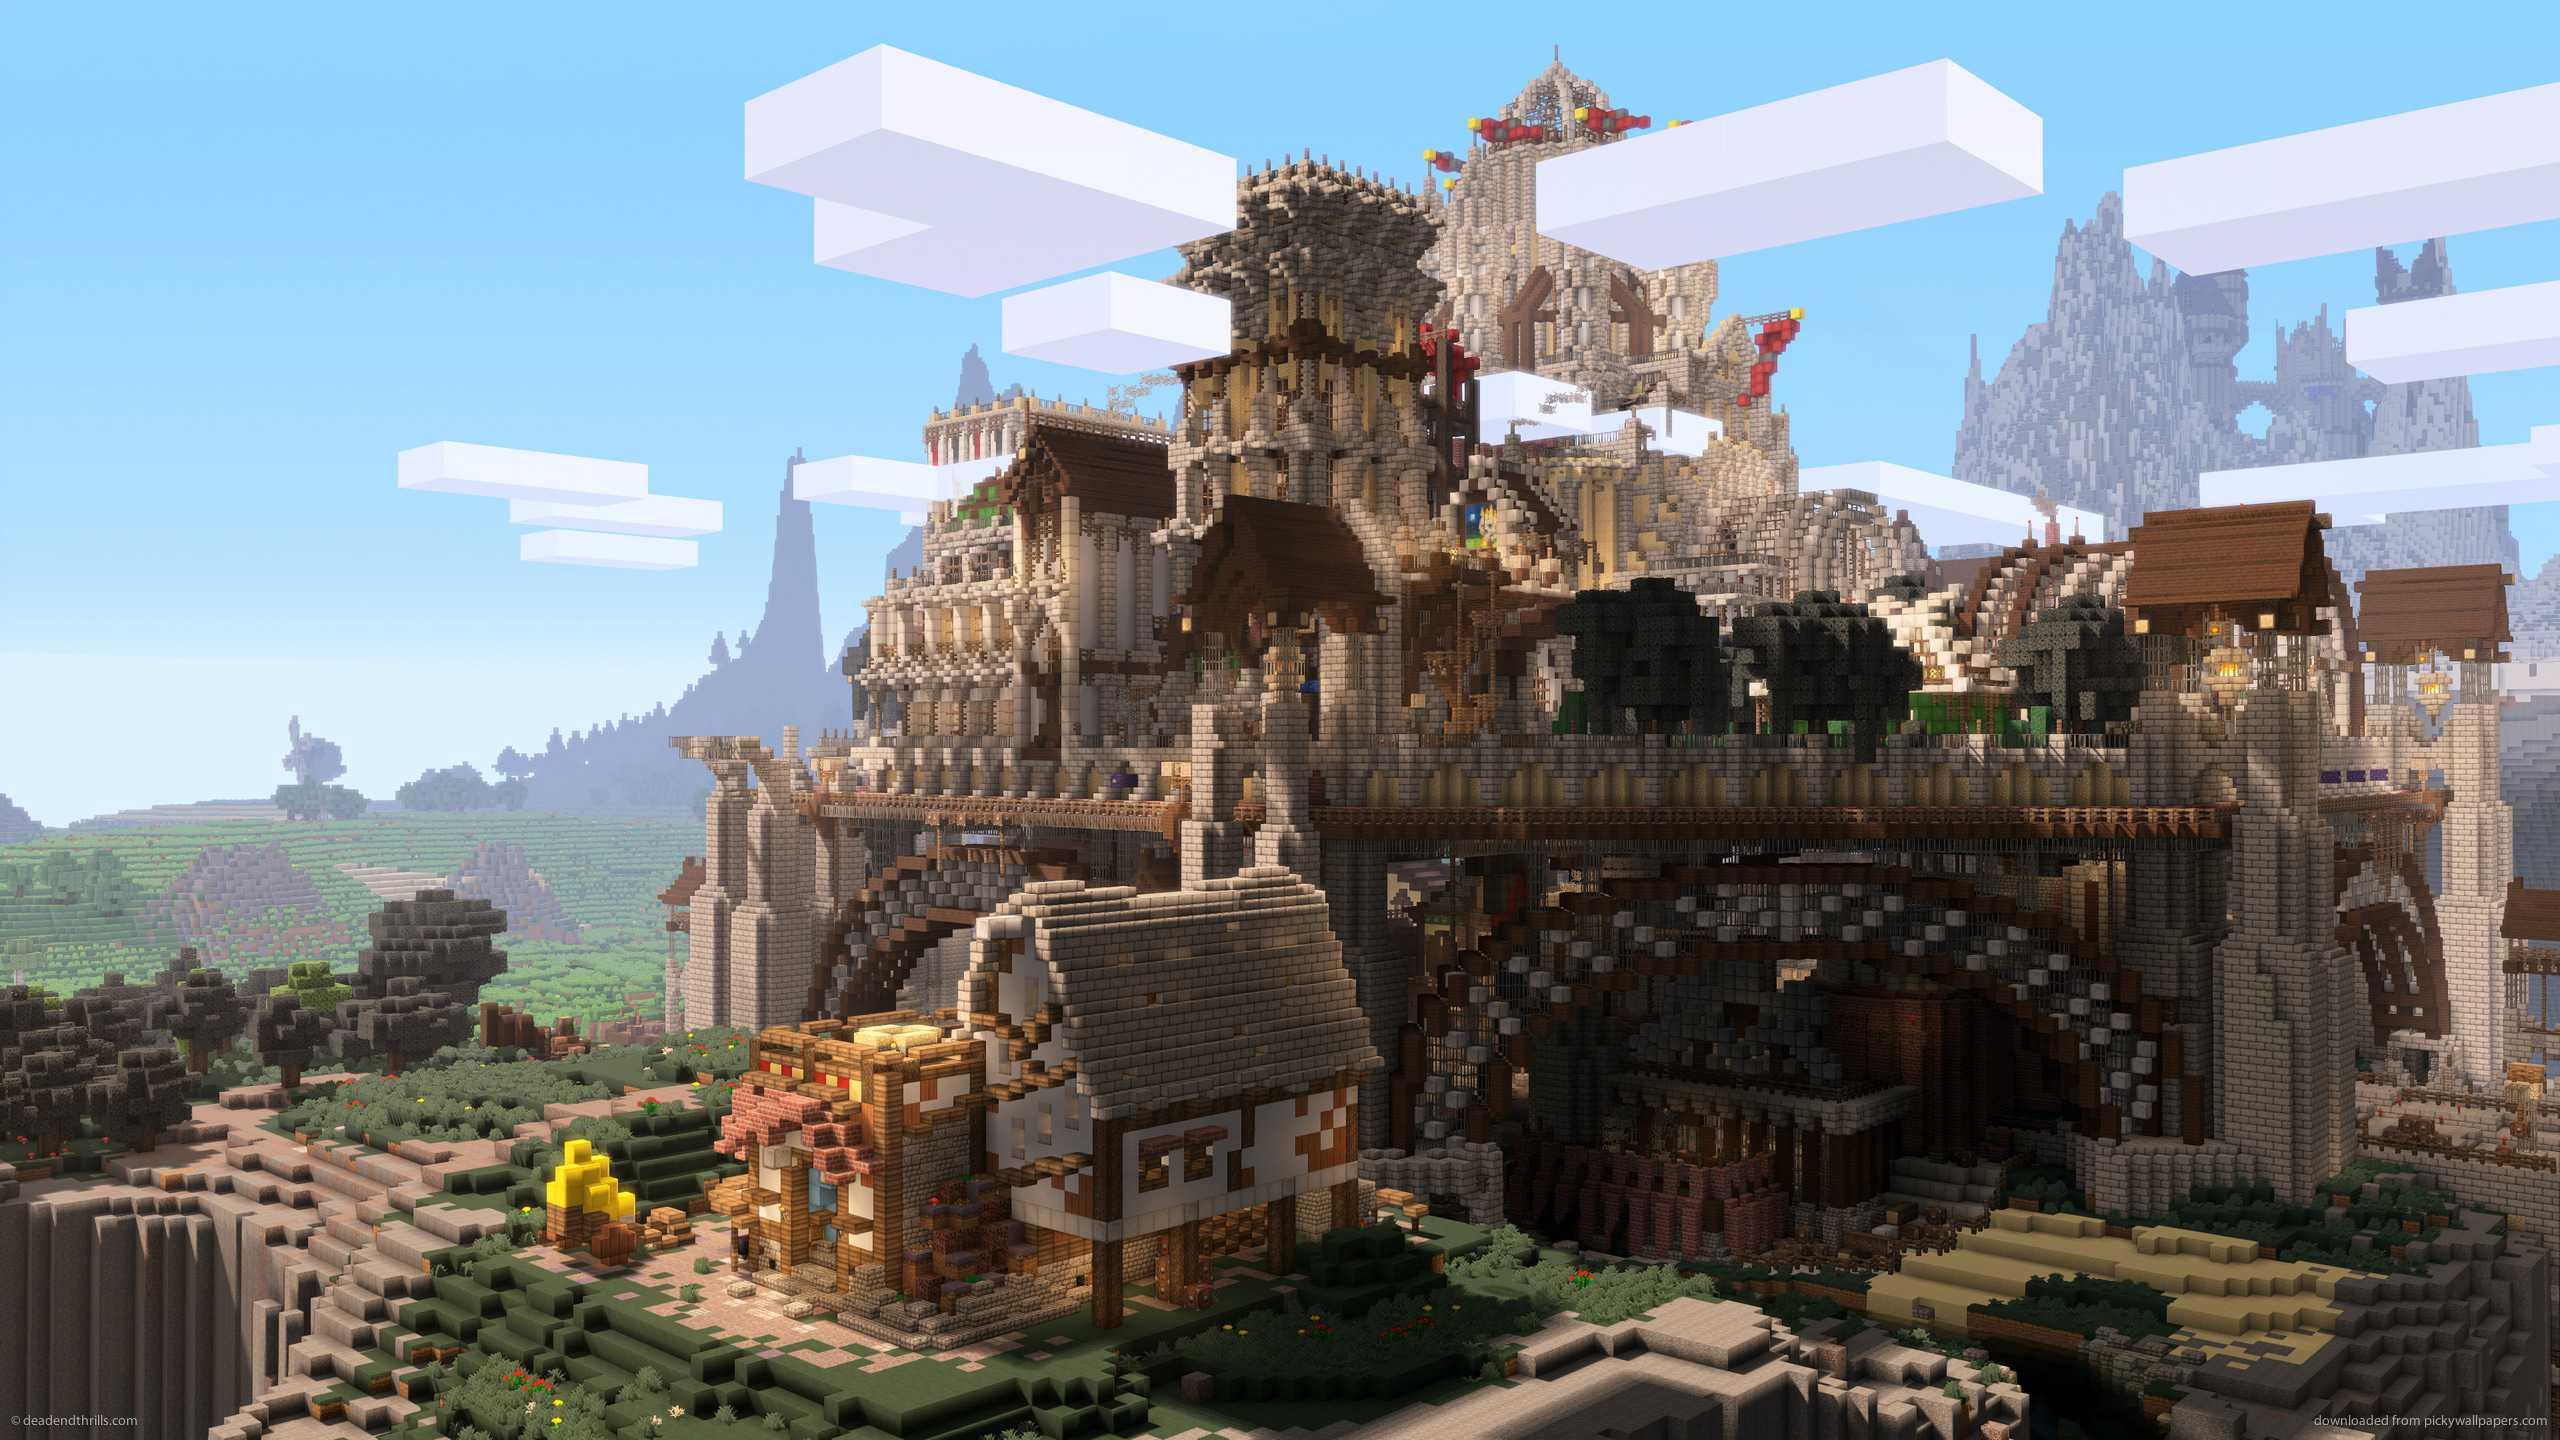 Minecraft city castle background wallpaper